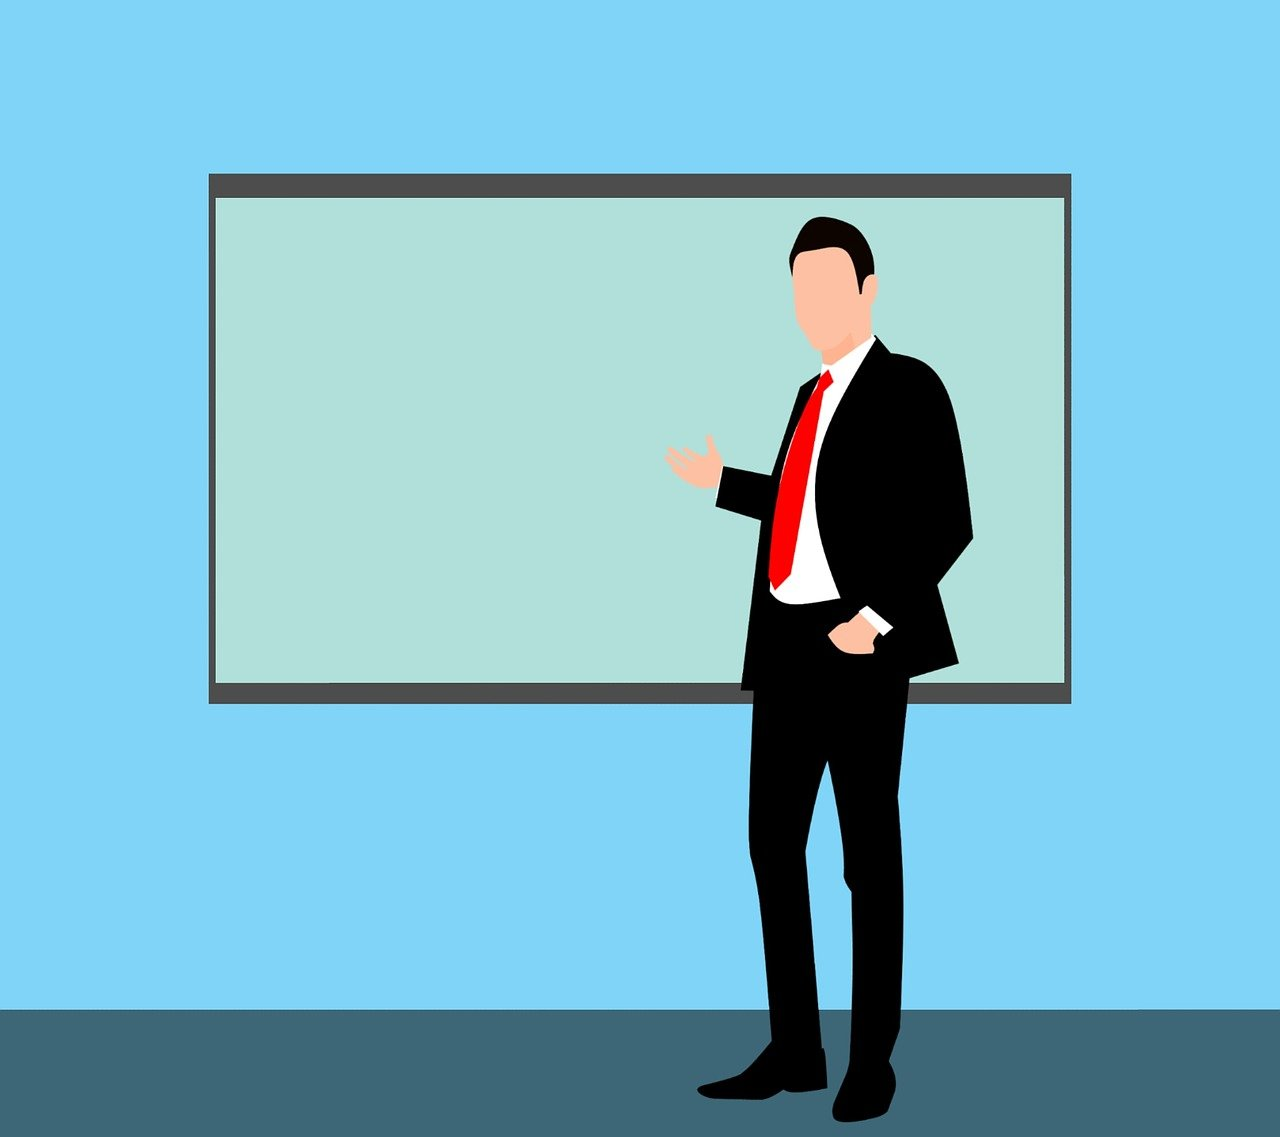 Vyondを学べるおすすめUdemy講座をご紹介【アニメーションを学ぼう】